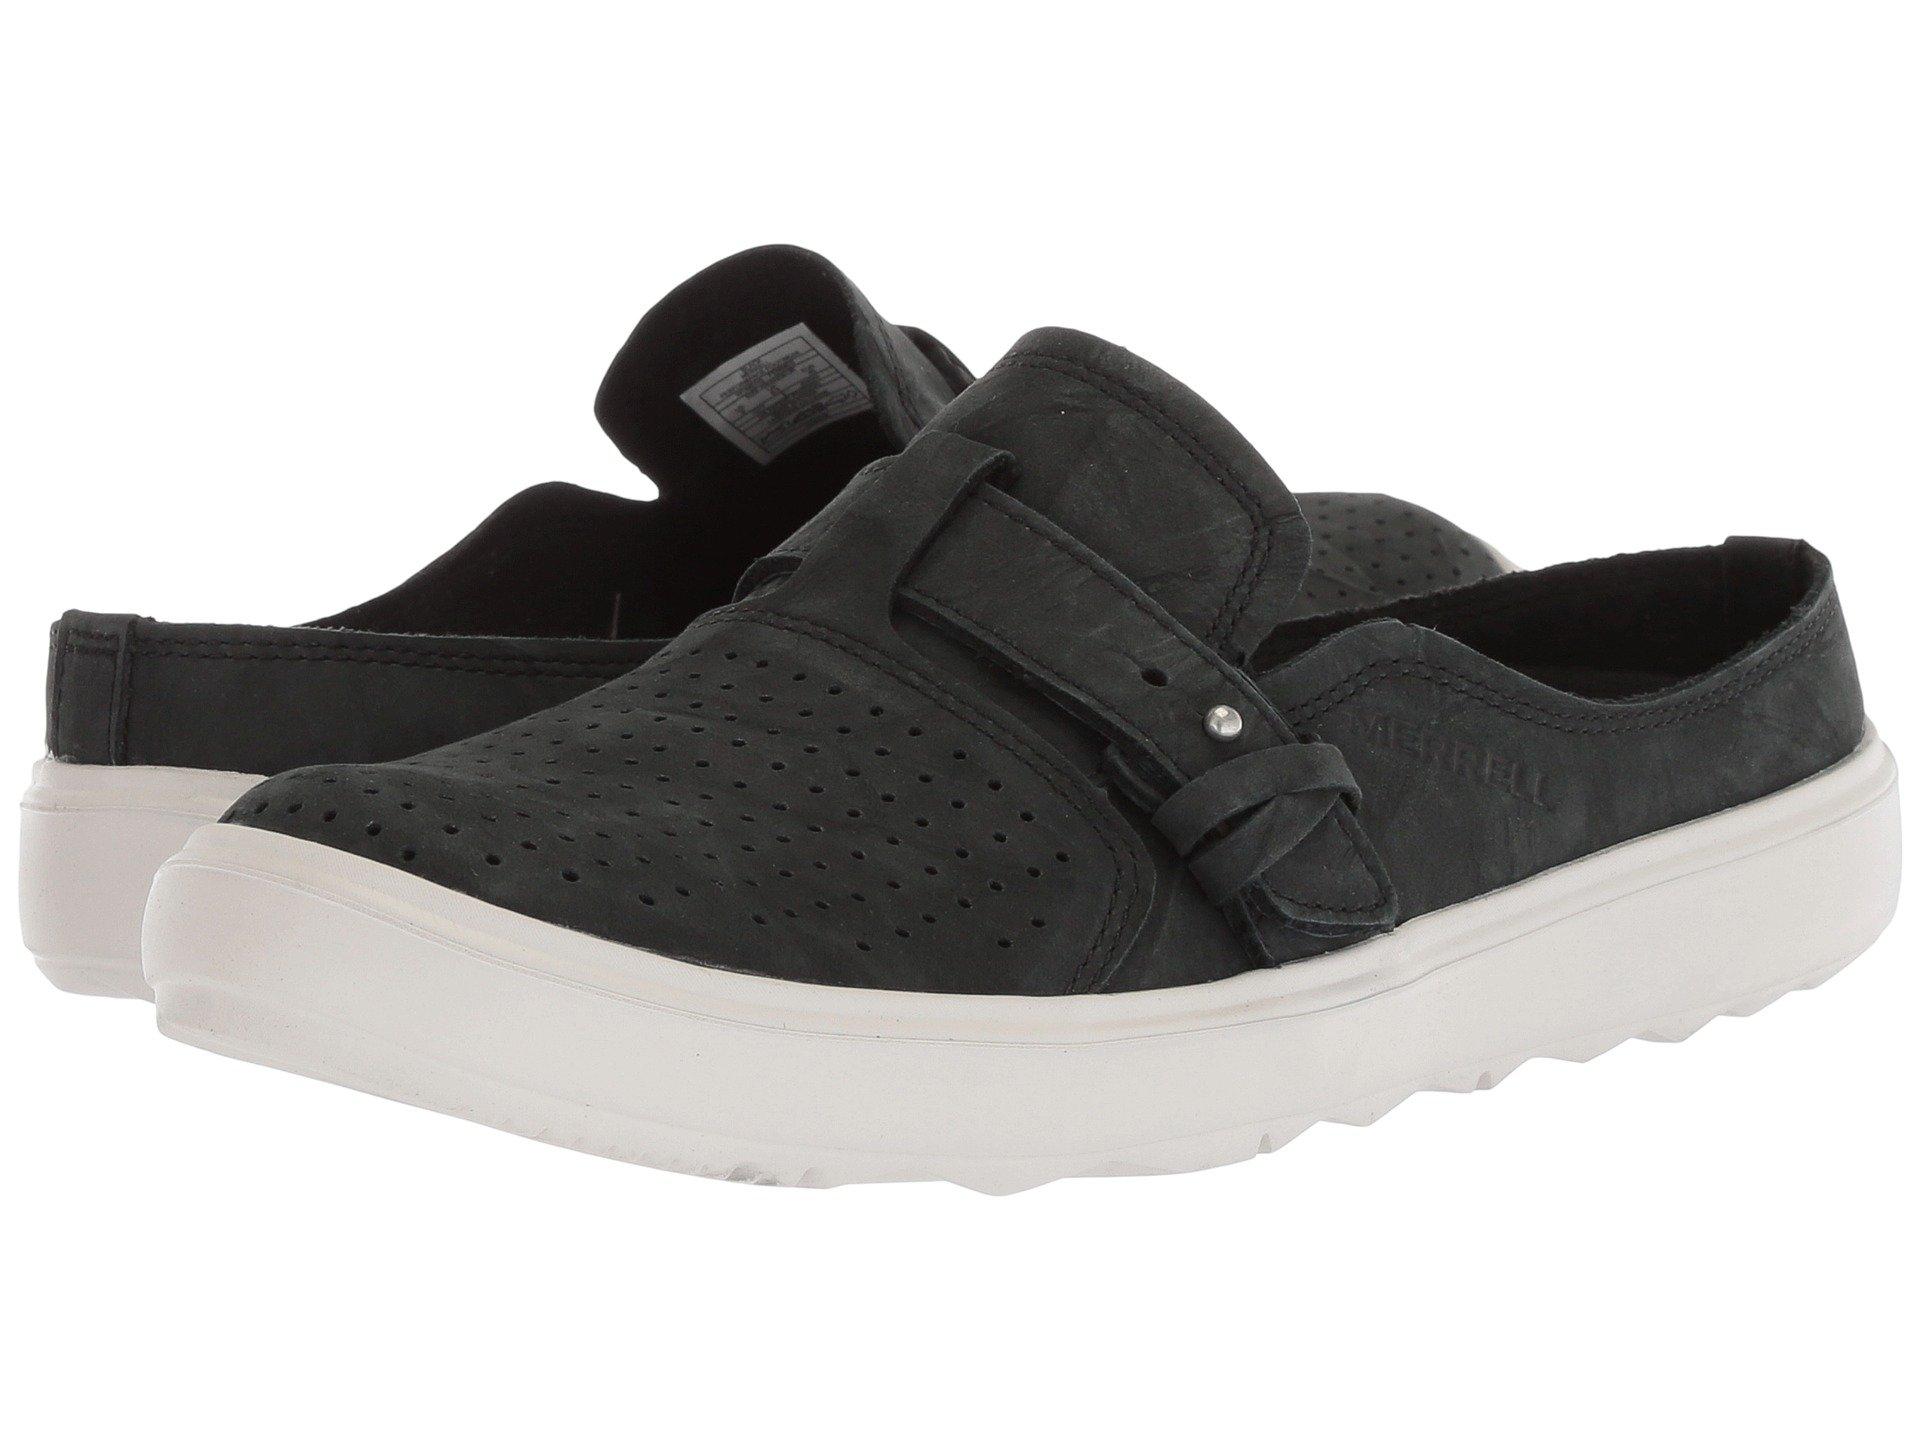 Around town slip on Merrell Shoes Women